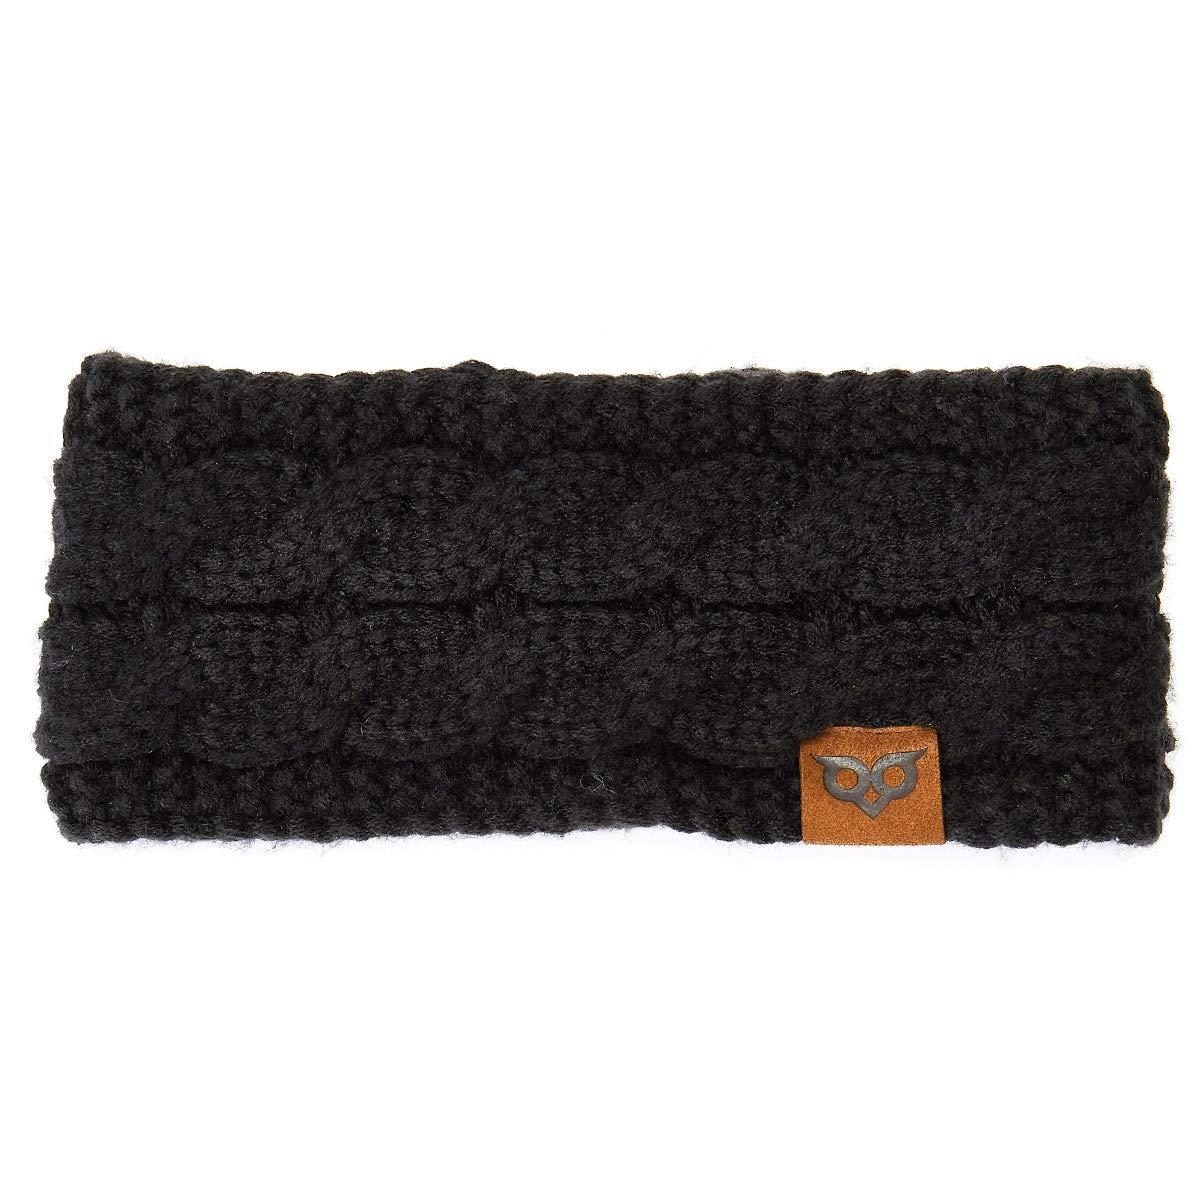 YOOWL Winter Beanie Headwrap Hat CapFashion Stretch Twisted Cable Knit Fuzzy Lined Ear Warmer Headband Women Black